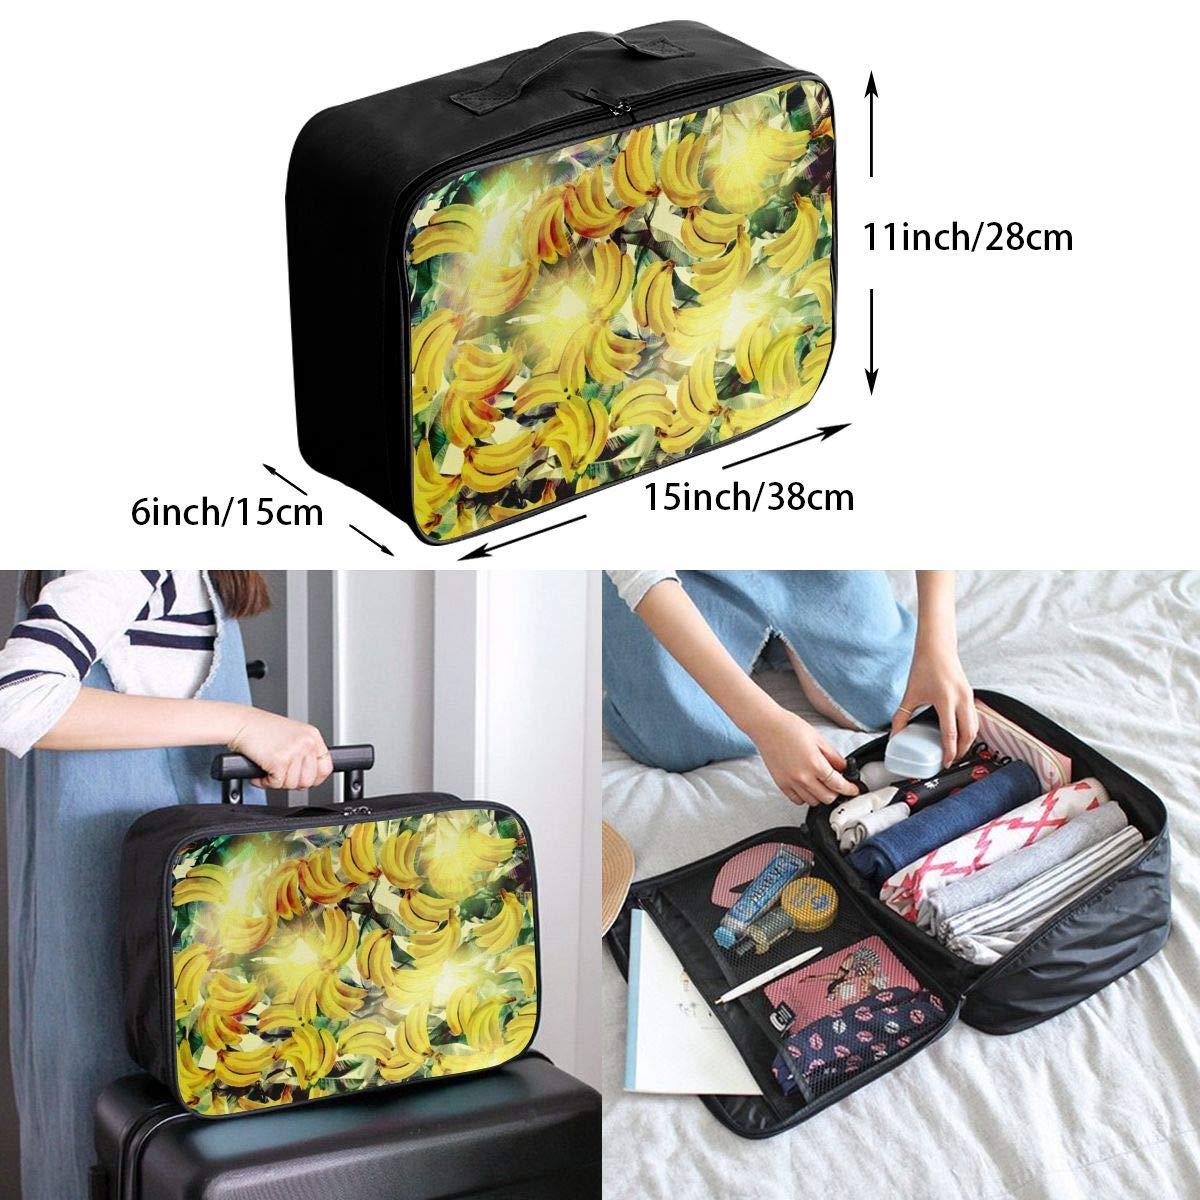 YueLJB Tropical Banana Lightweight Large Capacity Portable Luggage Bag Travel Duffel Bag Storage Carry Luggage Duffle Tote Bag